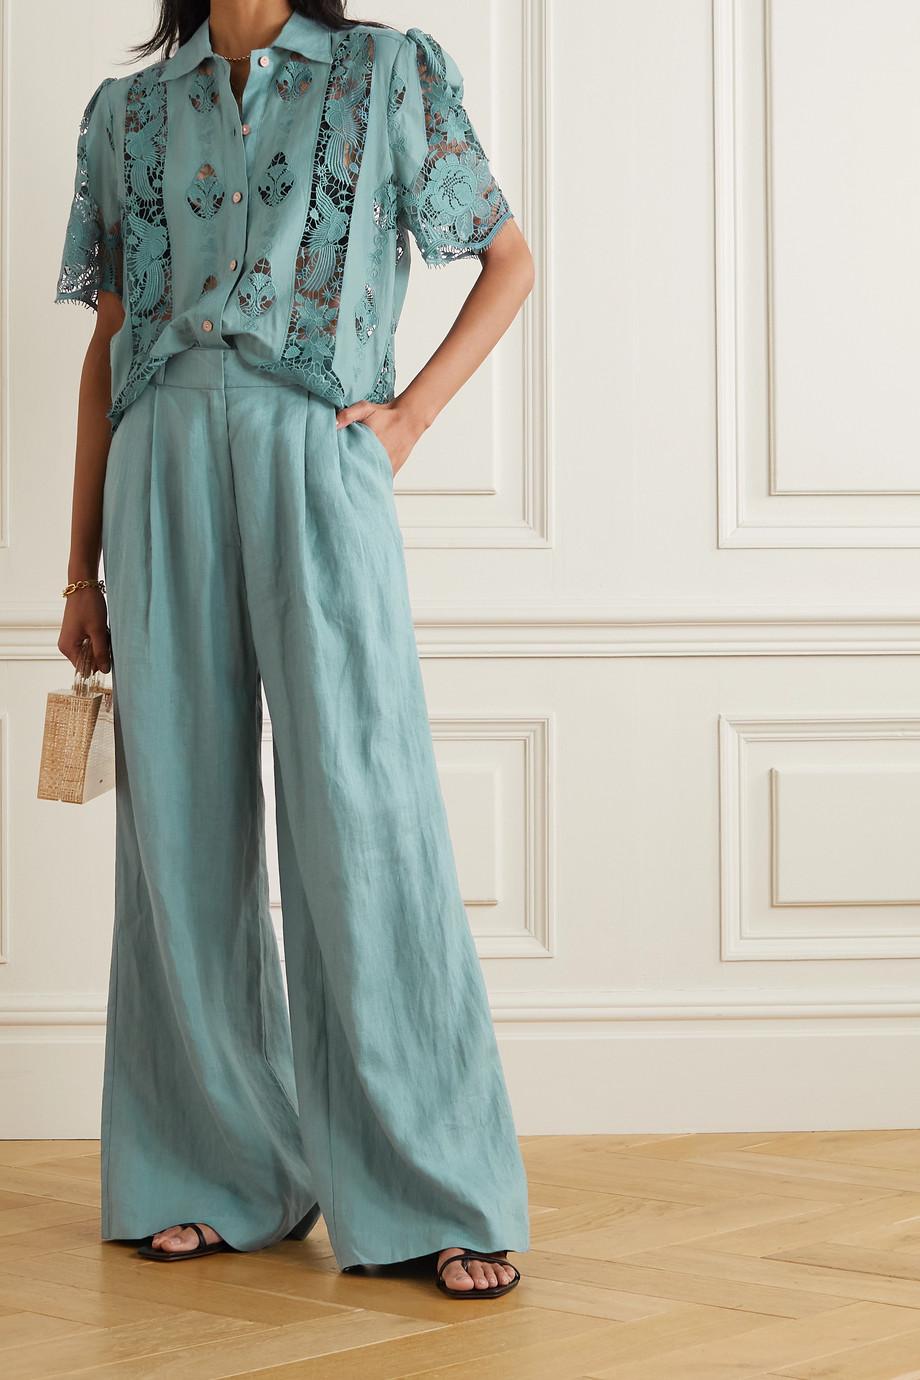 Miguelina Constance guipure lace-paneled cotton shirt